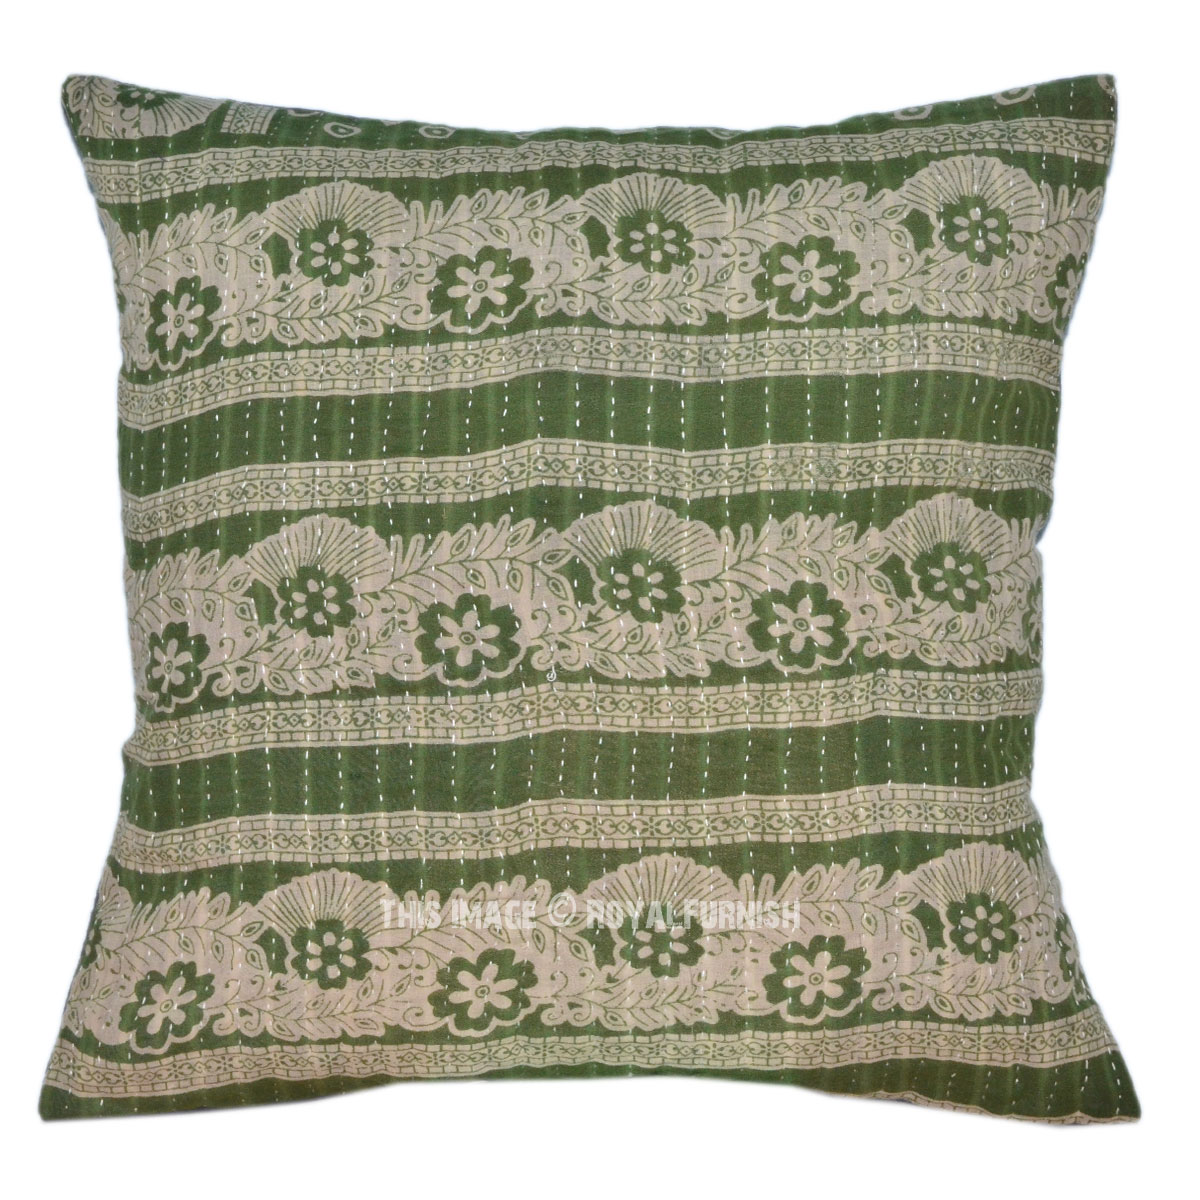 Quality Throw Pillows : 16x16